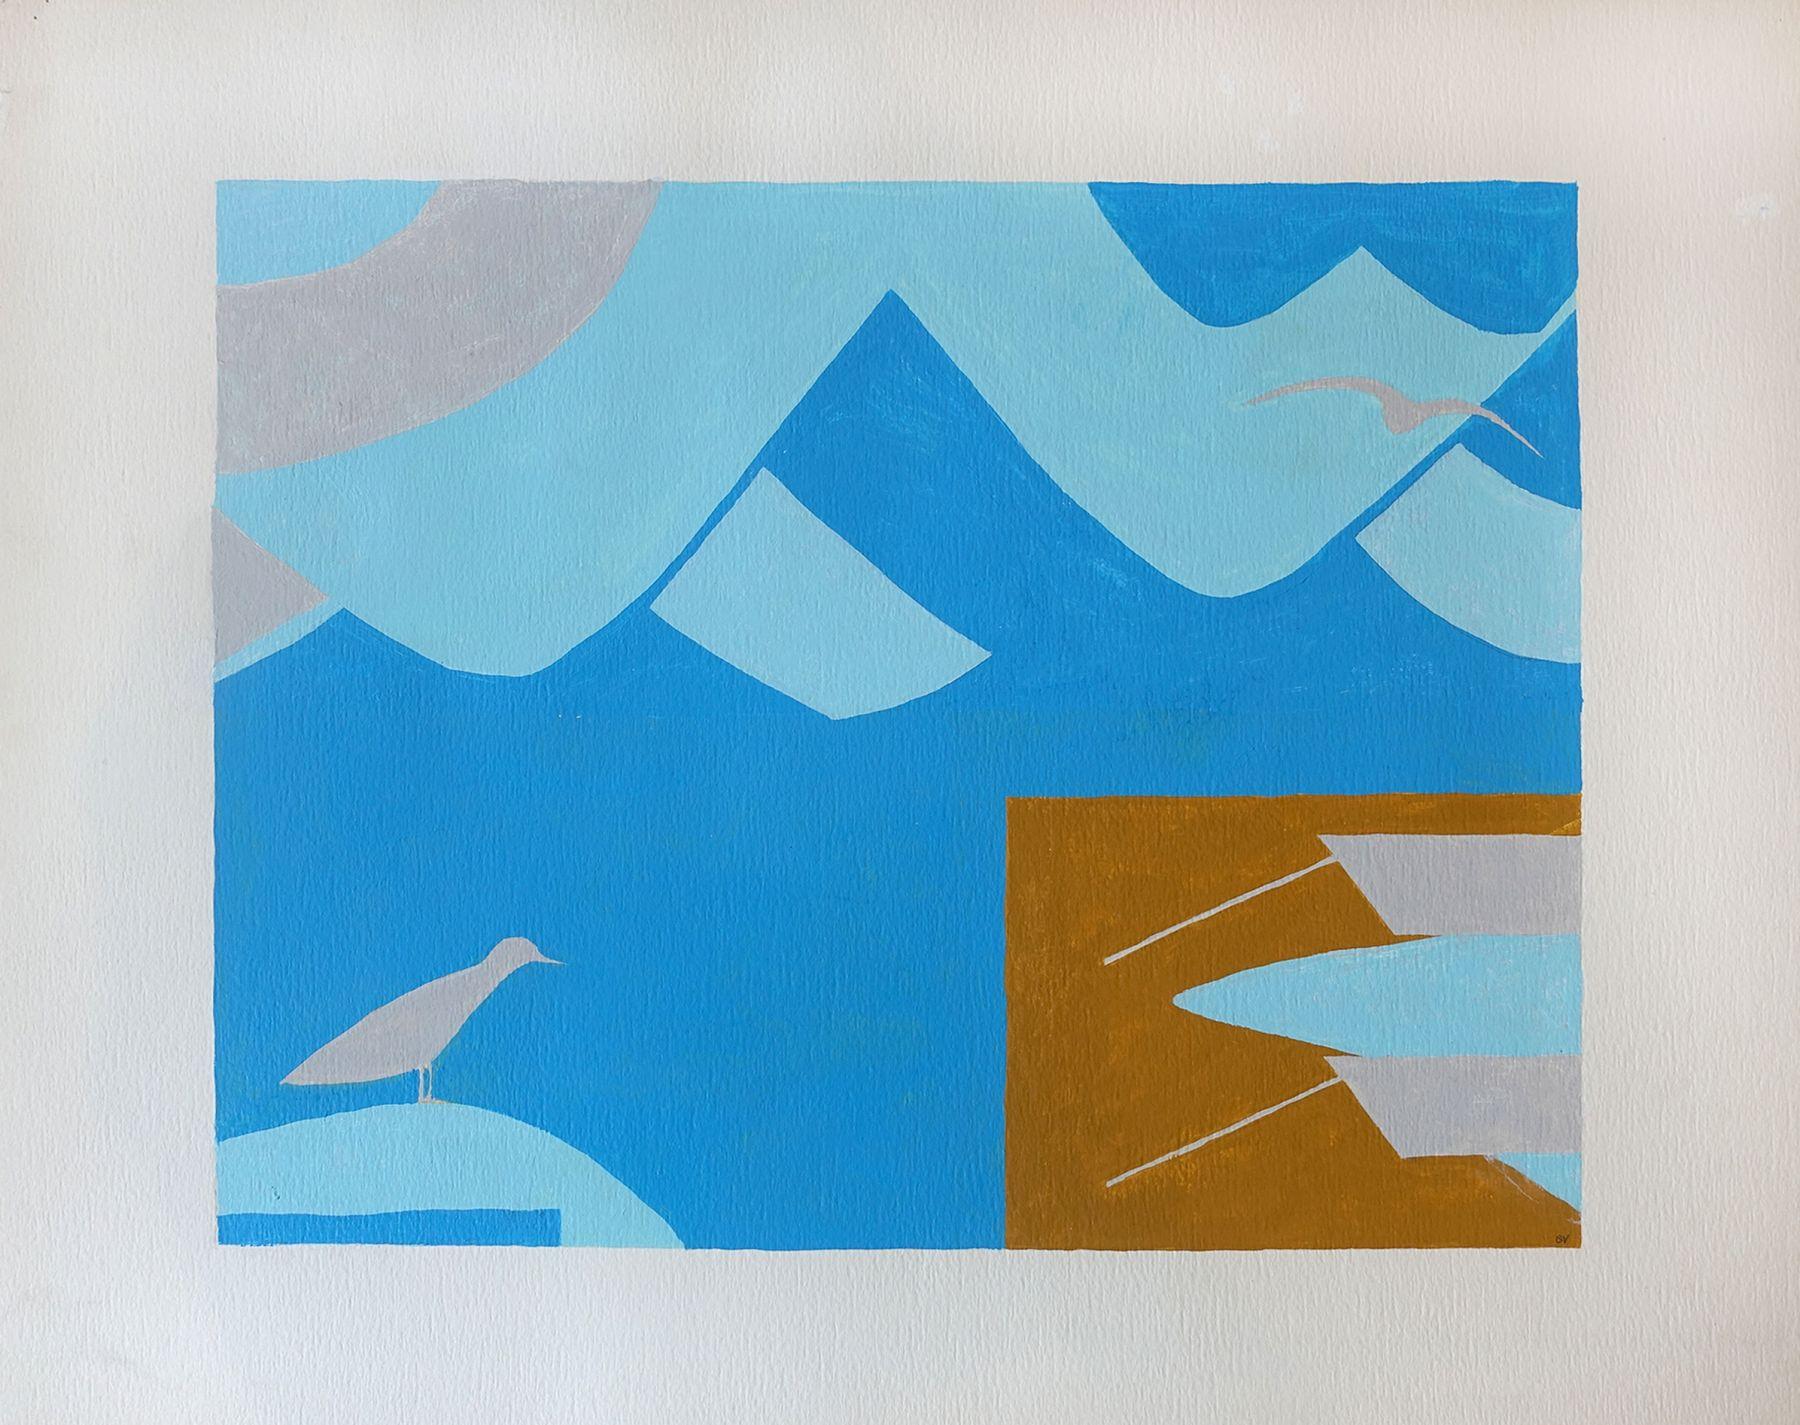 George Vranesh (1926-2014) Untitled (Birds at the Beach), 1986